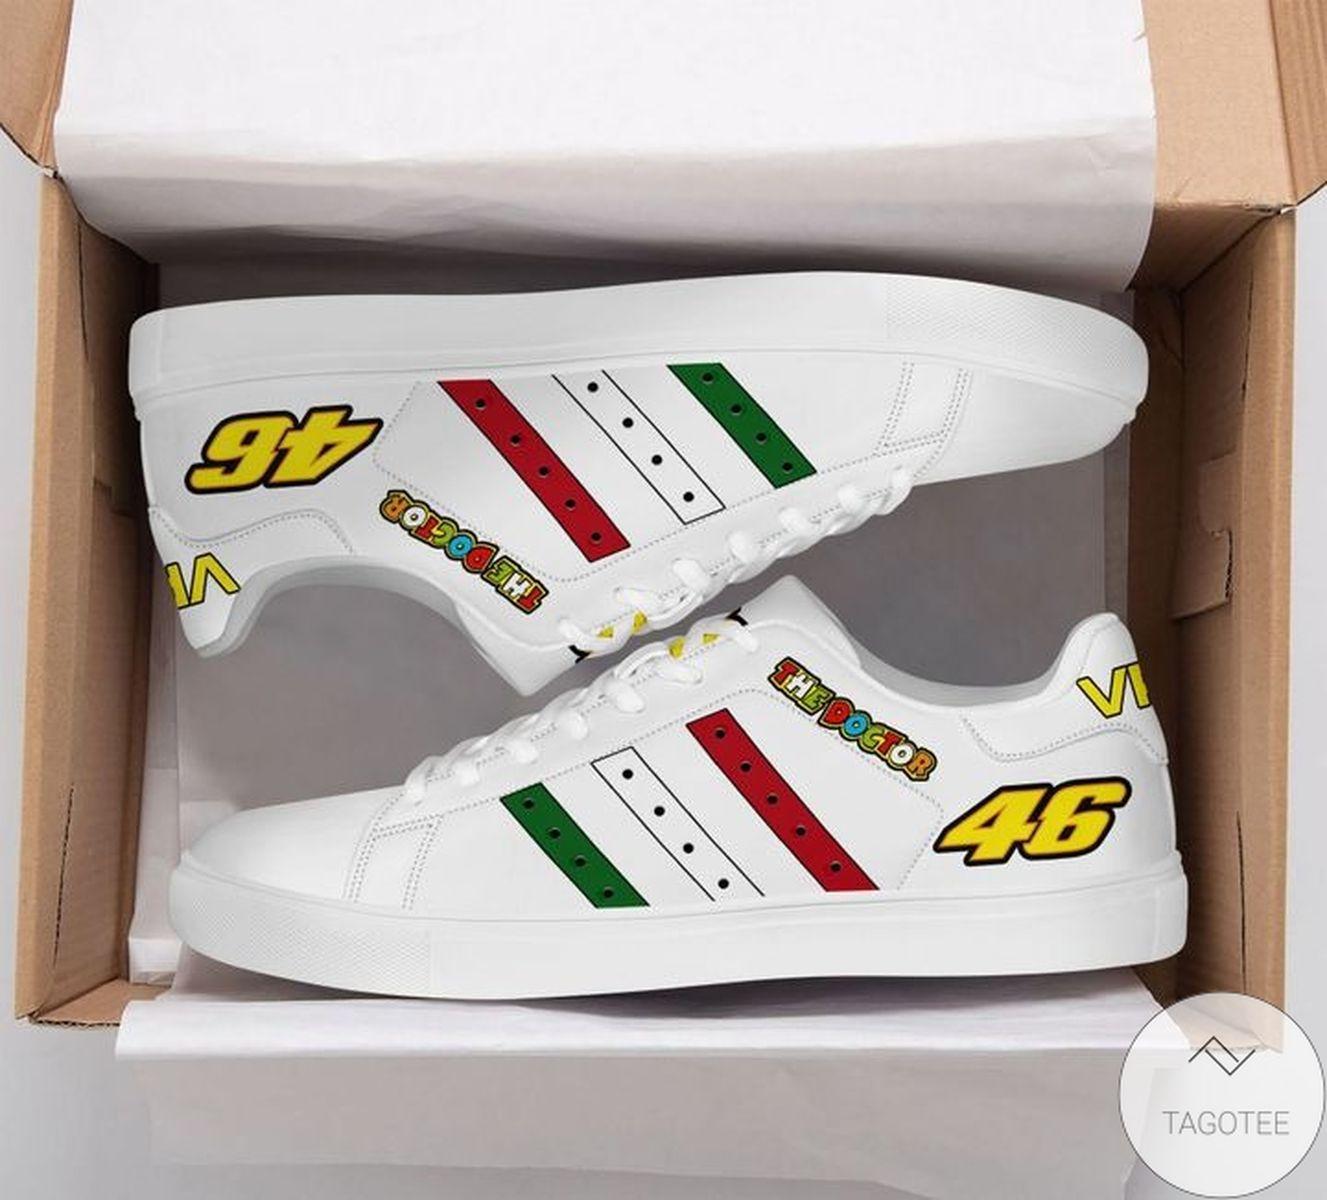 Valentino Rossi Vr46 Stan Smith Shoes